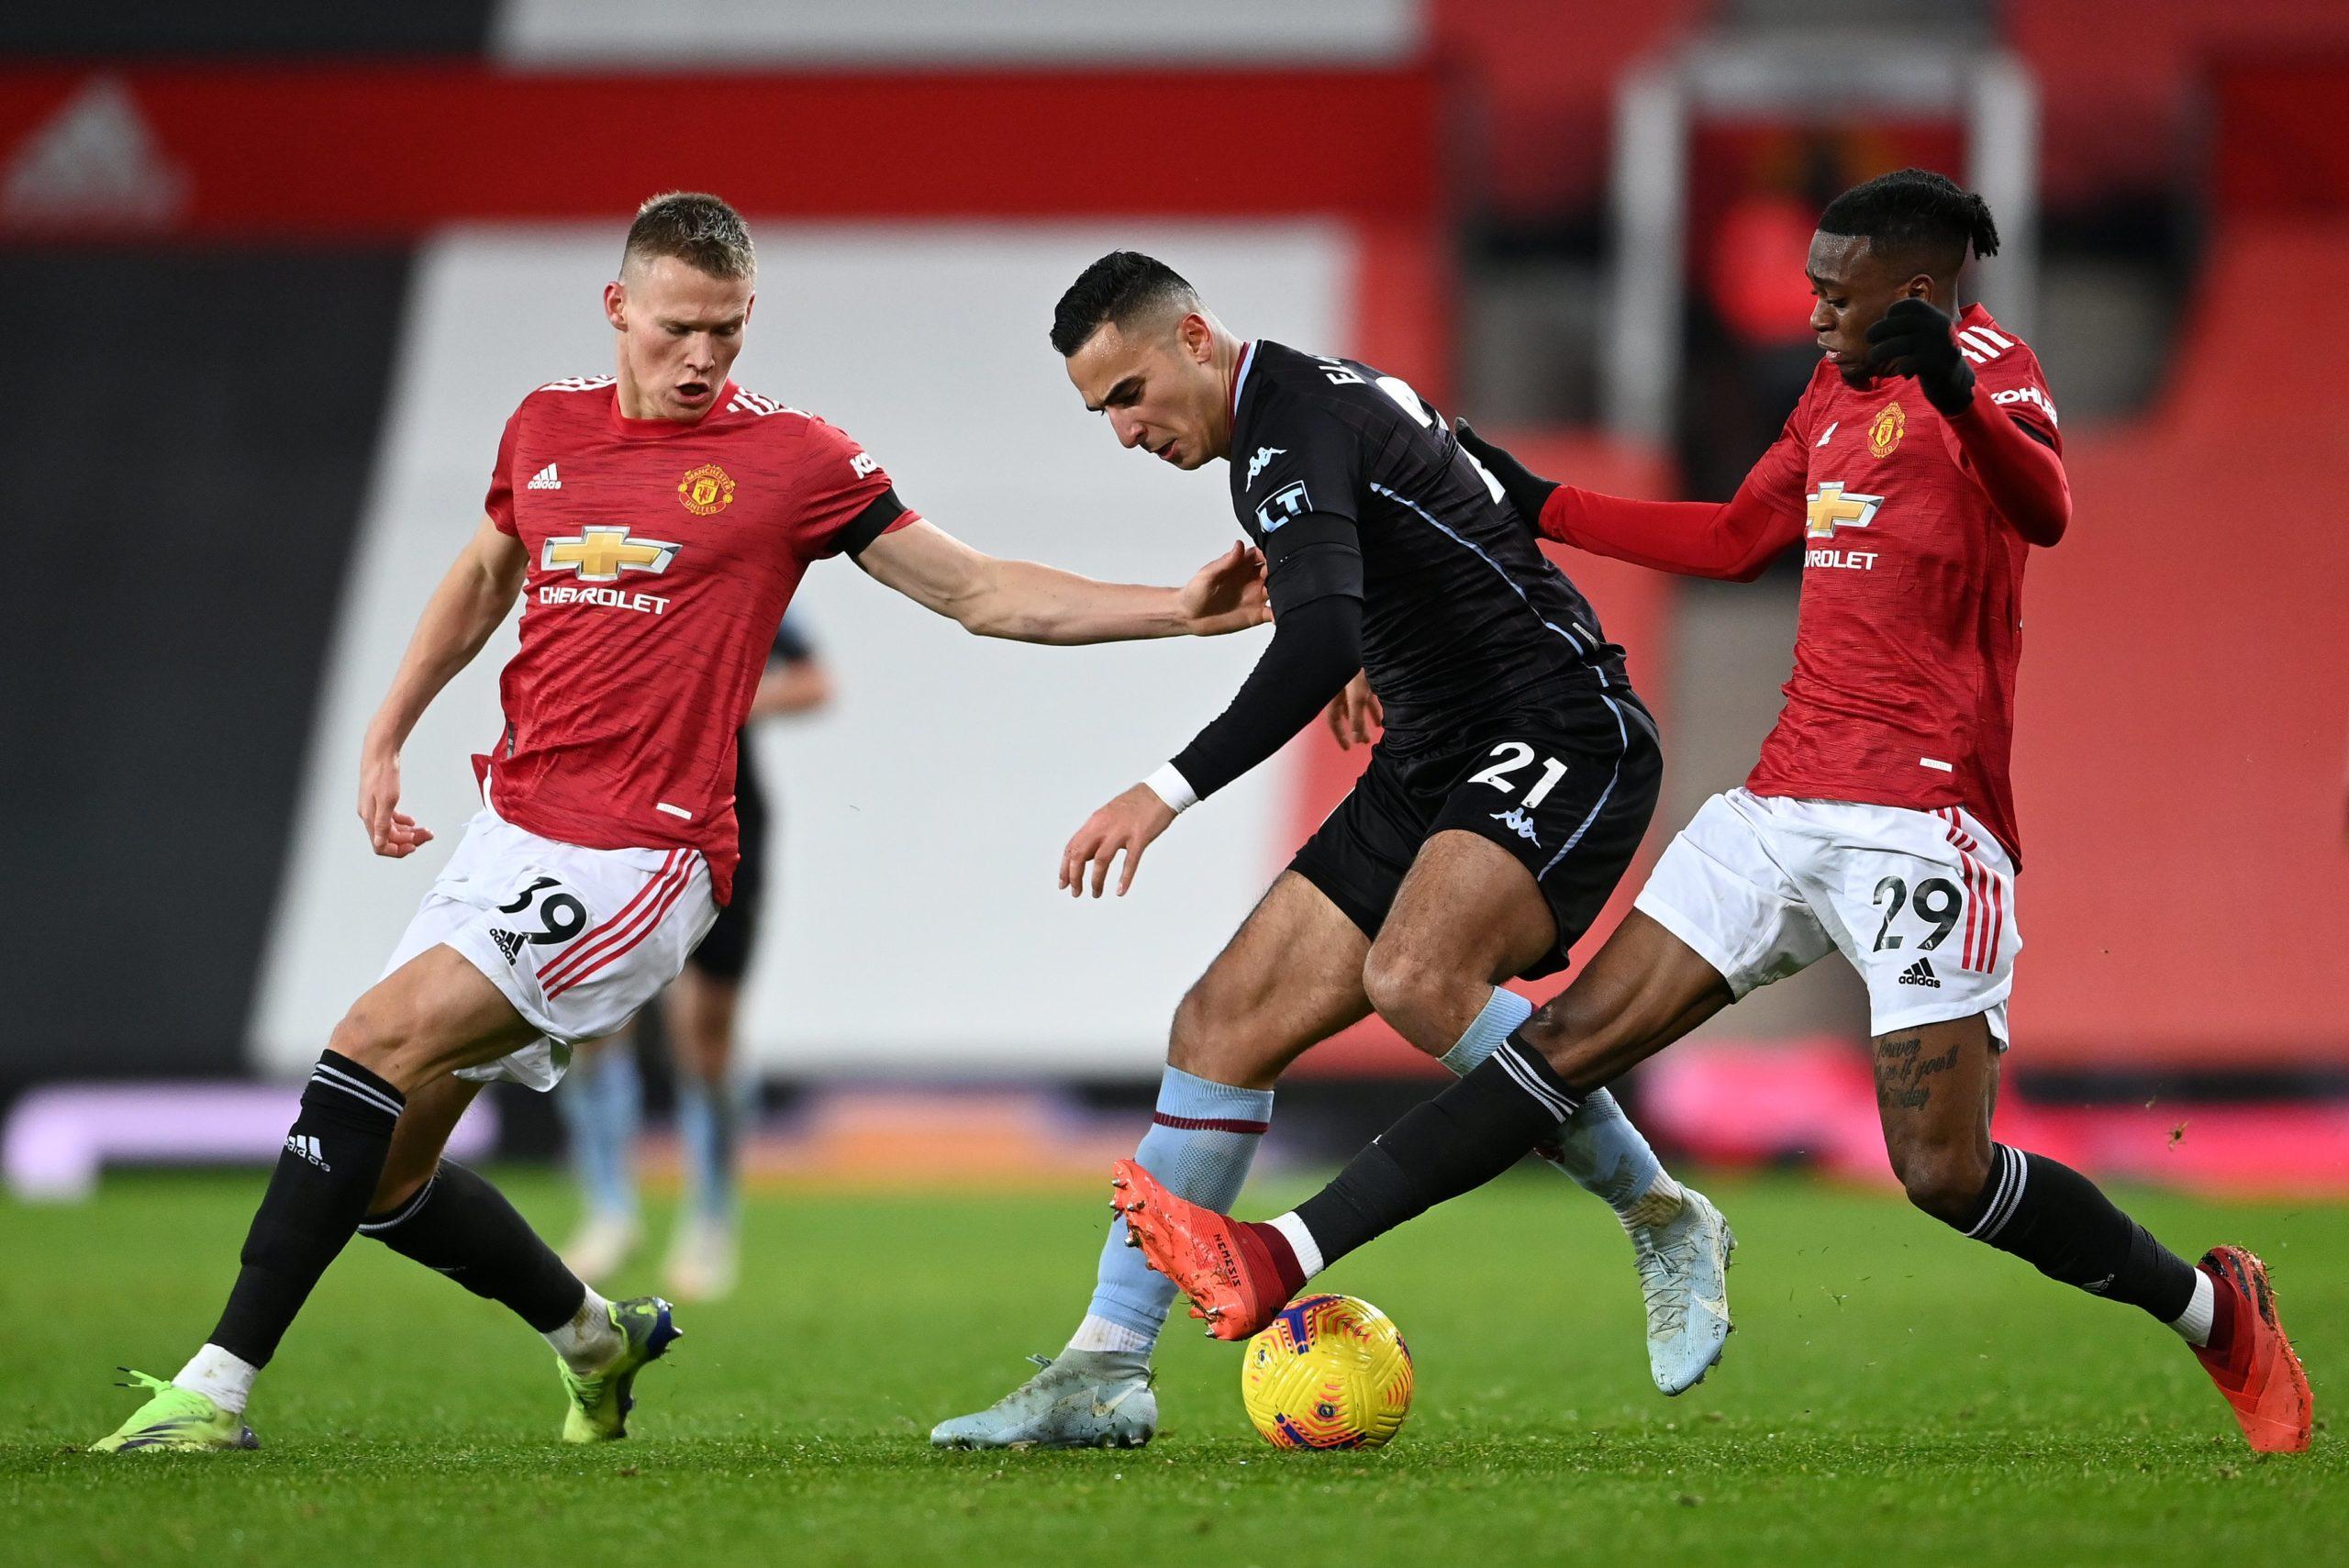 Manchester United against Aston Villa [PHOTO CREDIT: @ManUtd]